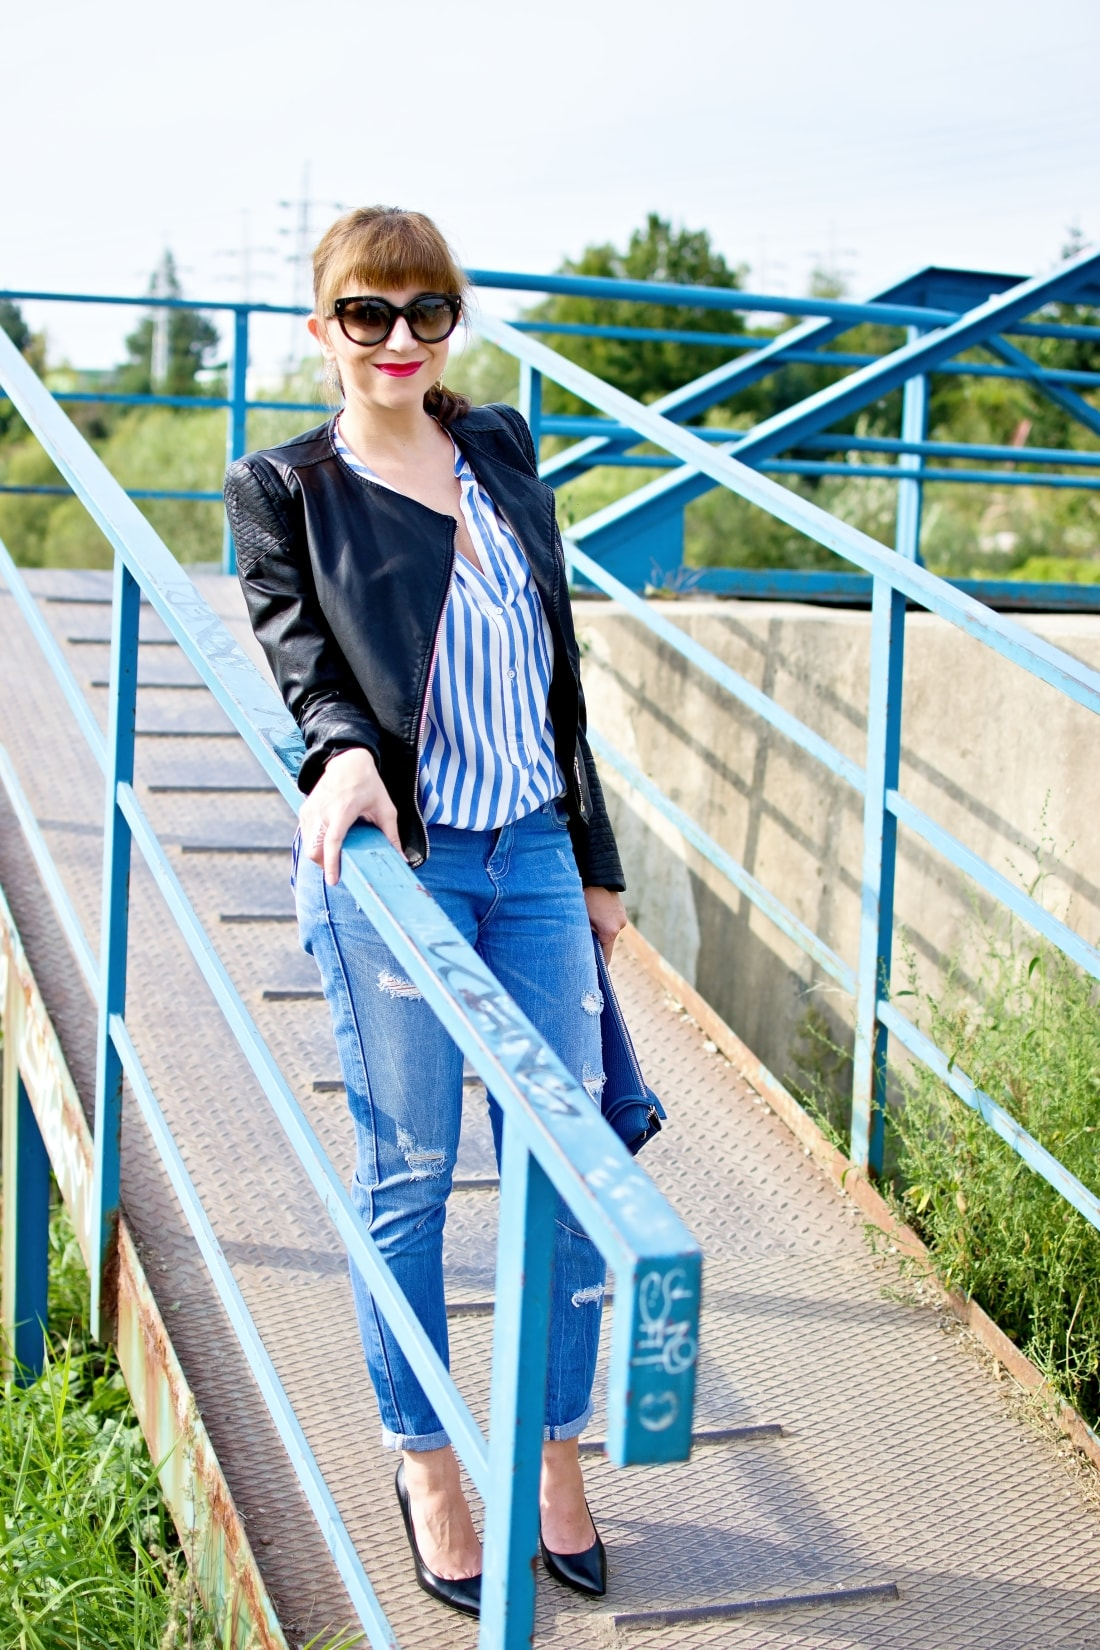 Move, move, move_Katharine-fashion is beautiful_4_Blog_Kožená bunda_Roztrhané džínsy_Prúžkovaná blúzka_Kabelka Parfois_Katarína Jakubčová_Fashion blogger